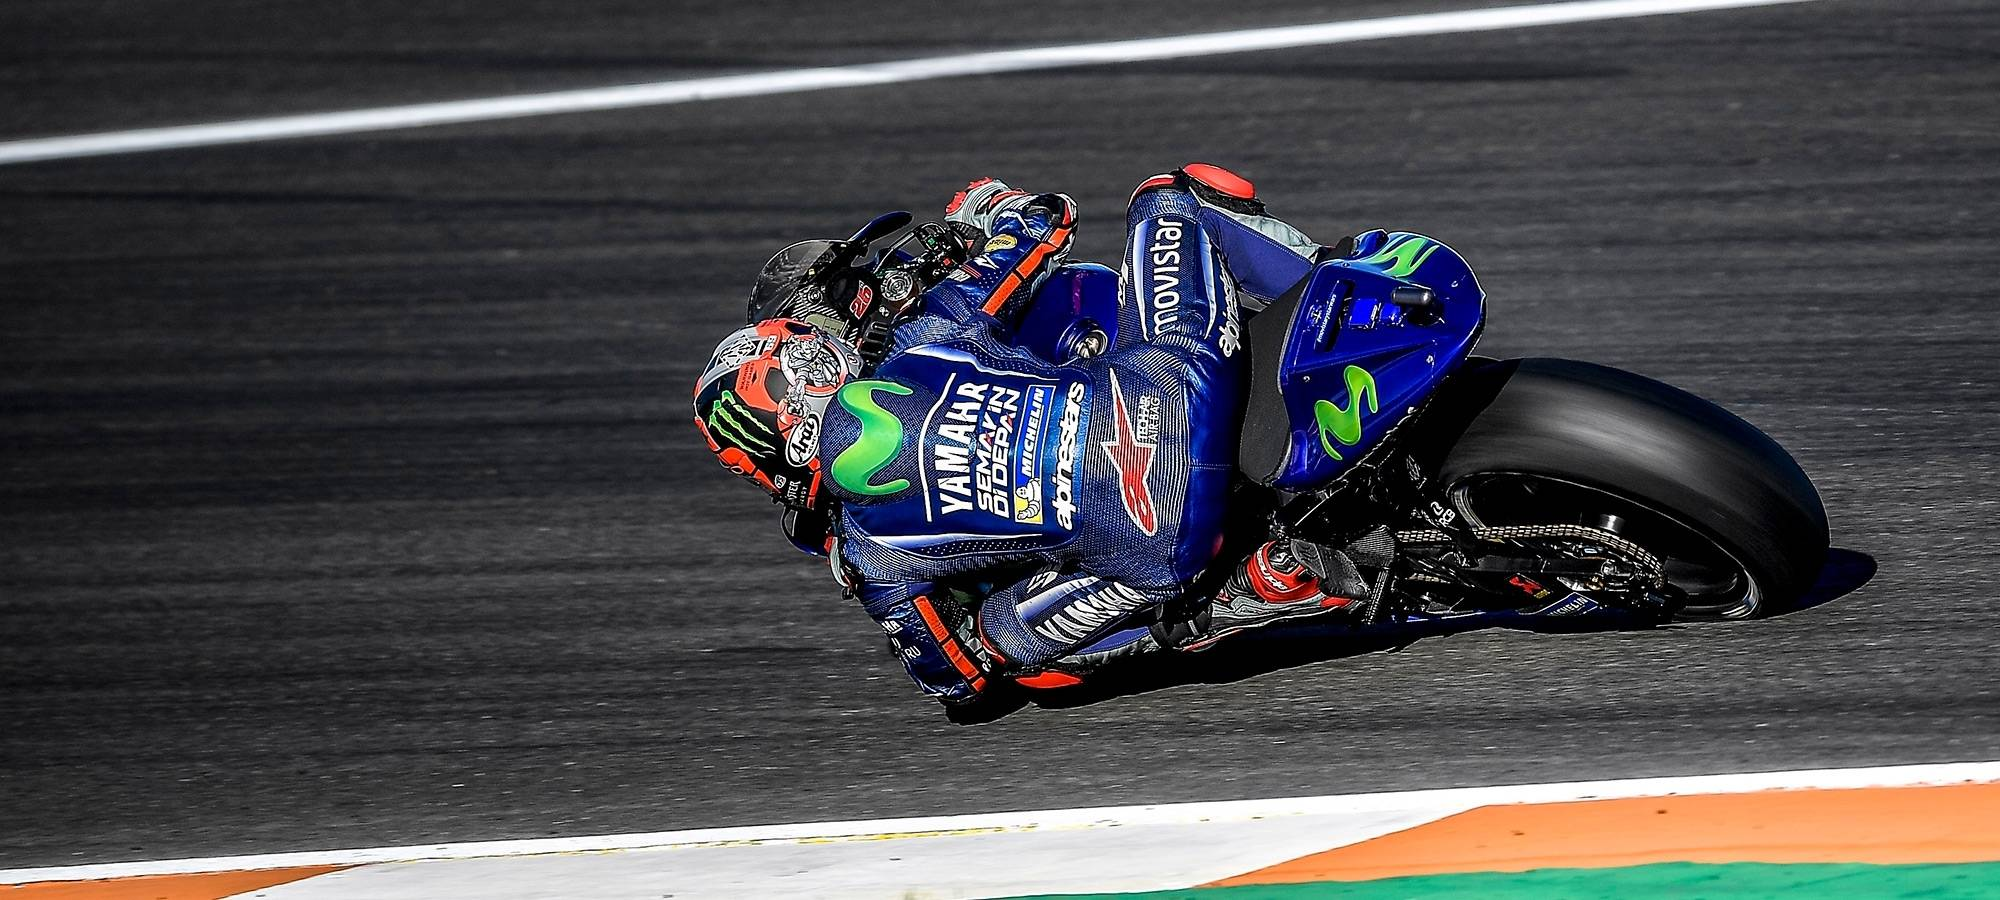 Maverci_Vinales_MotoGP_2018_Yamaha_team